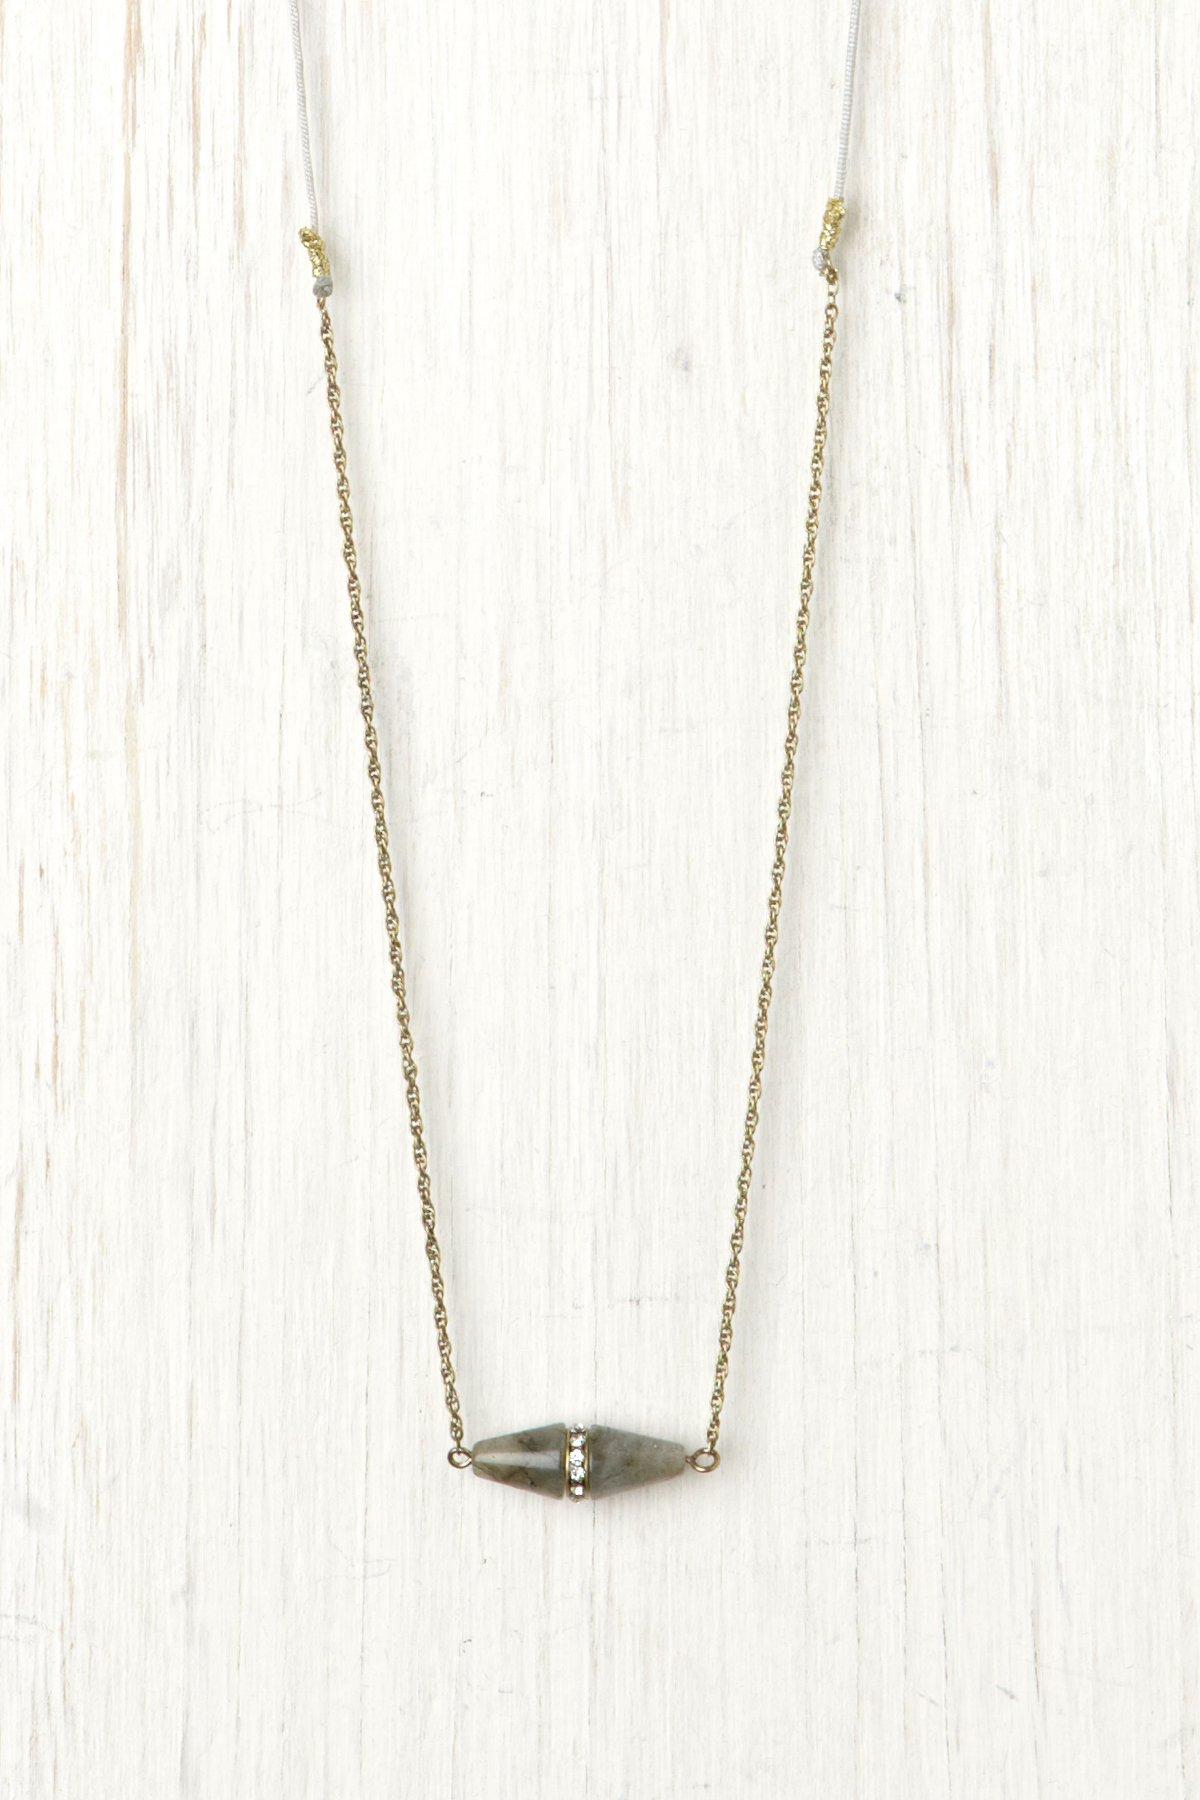 Inspirit Layering Necklaces